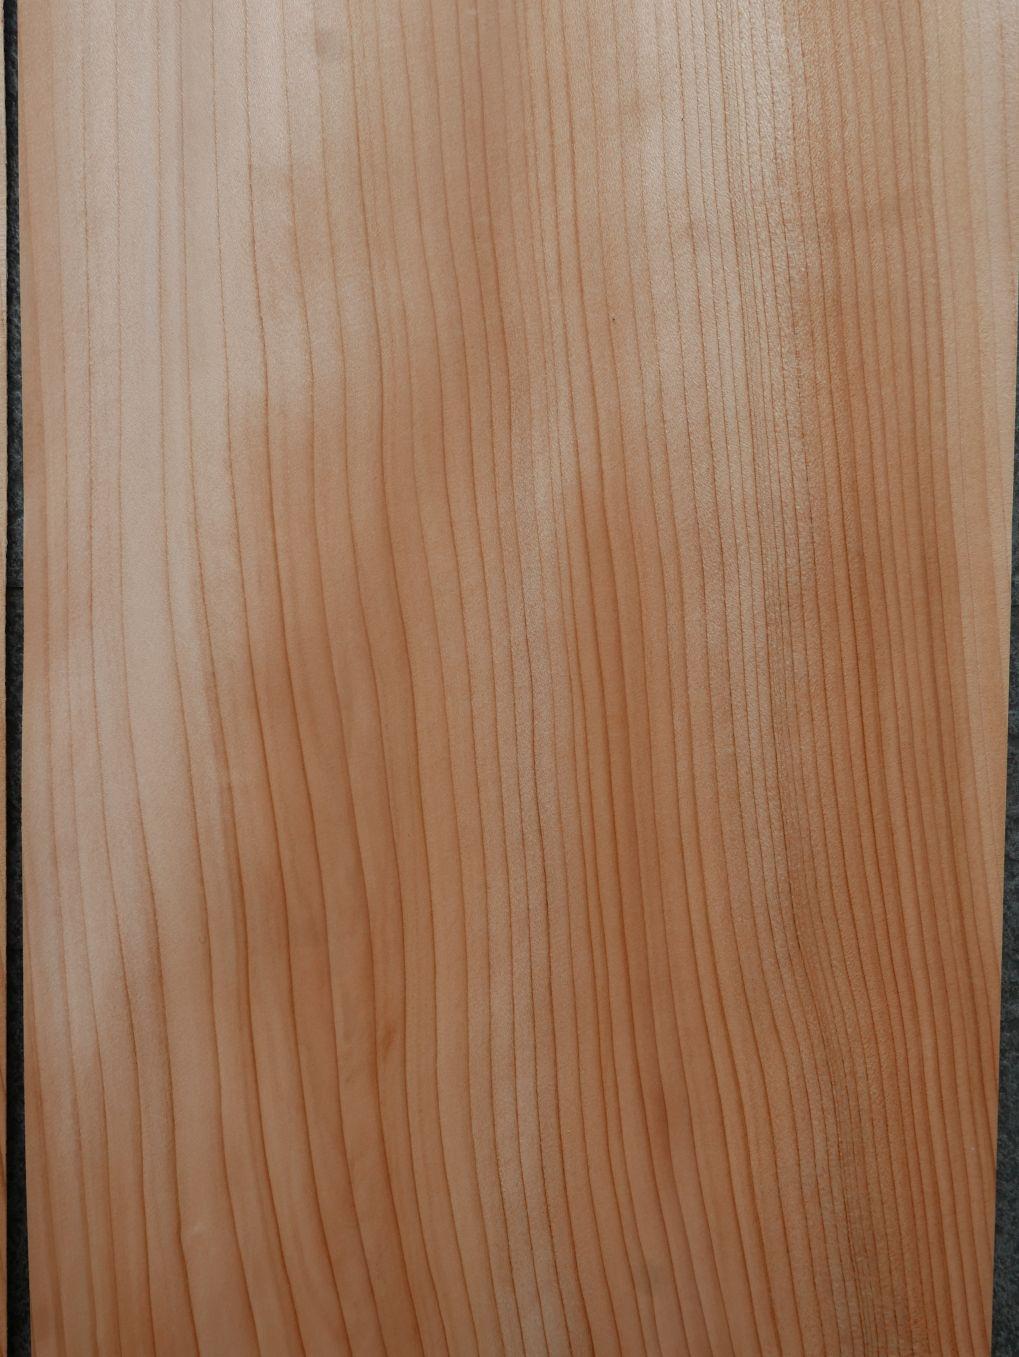 A0362-1 Libanon Ceder 35-36,5x116cm 24st